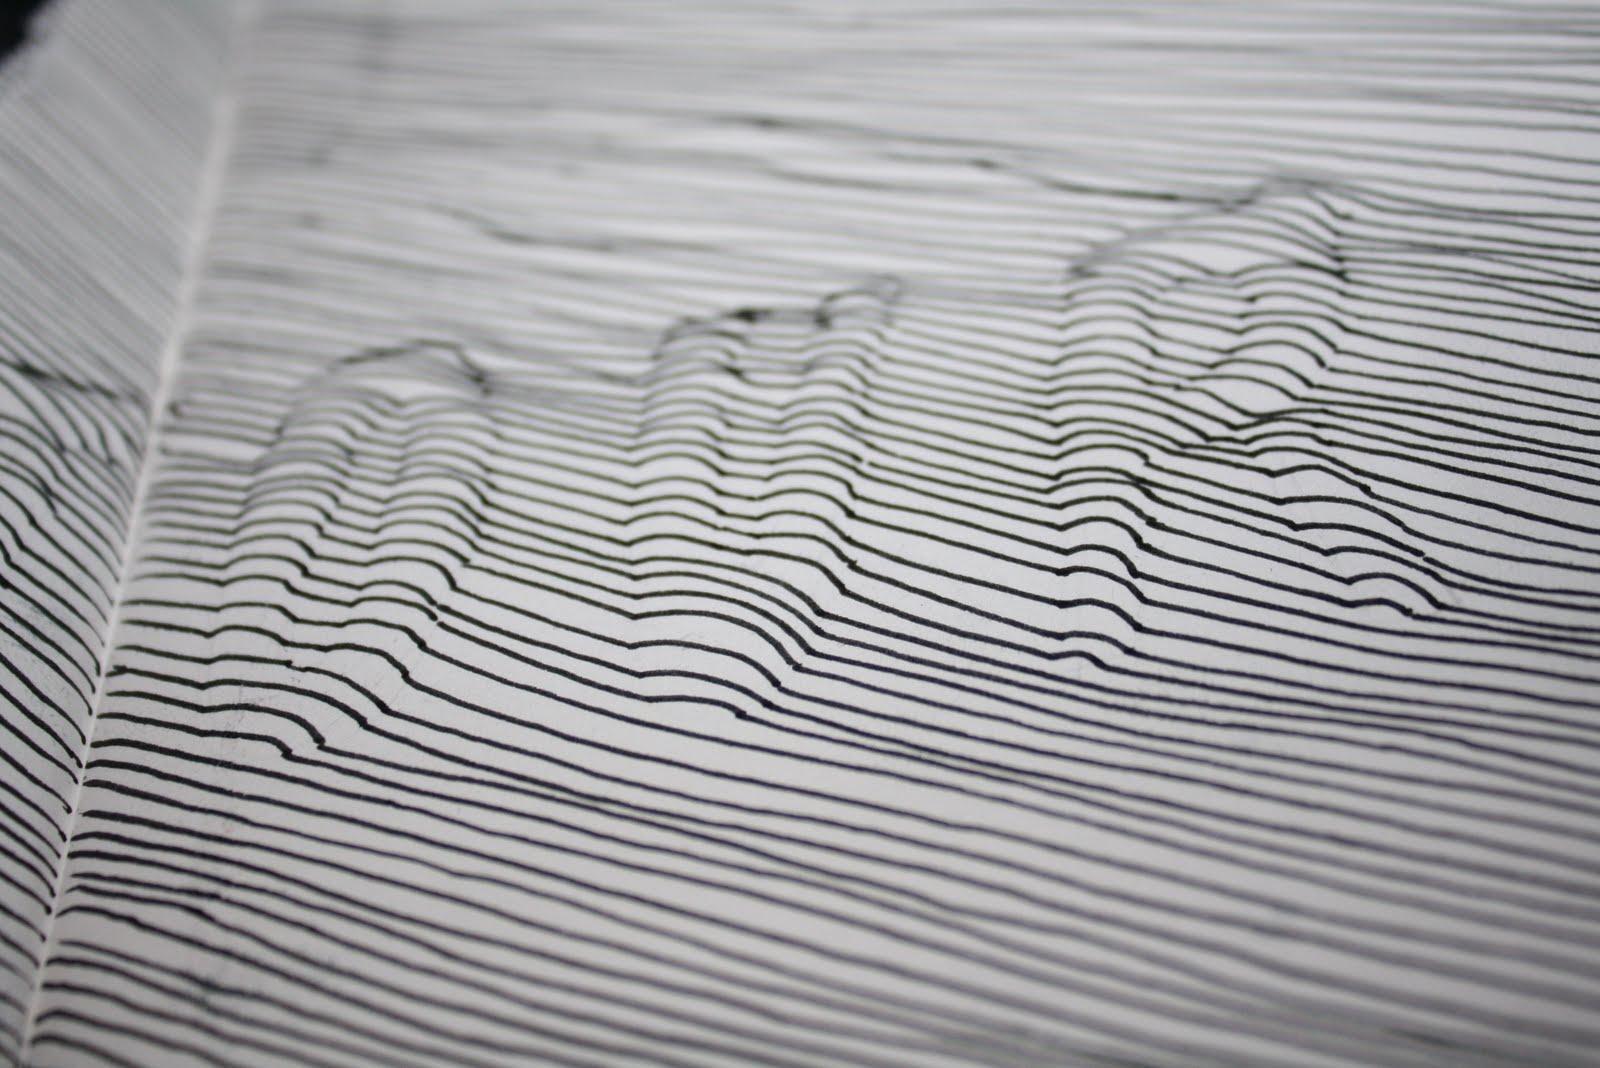 Types Of Contour Line Drawing : Design practice contour type